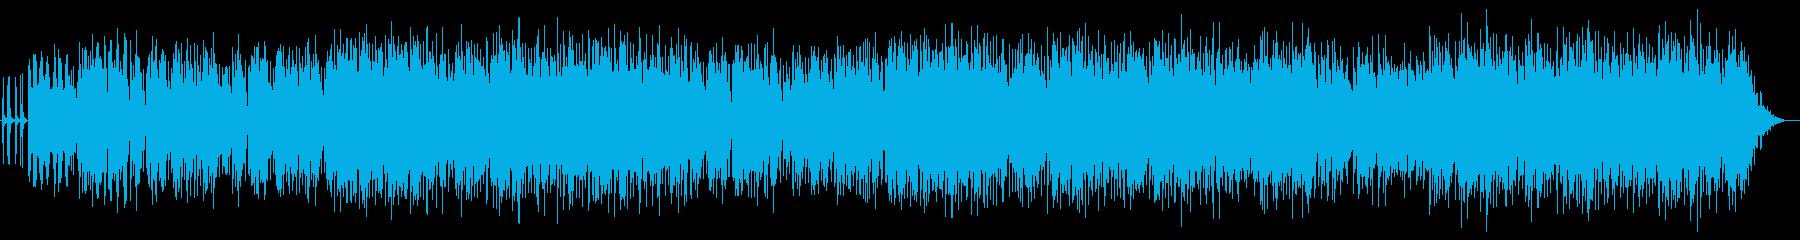 80's風シンセポップ(インスト)の再生済みの波形